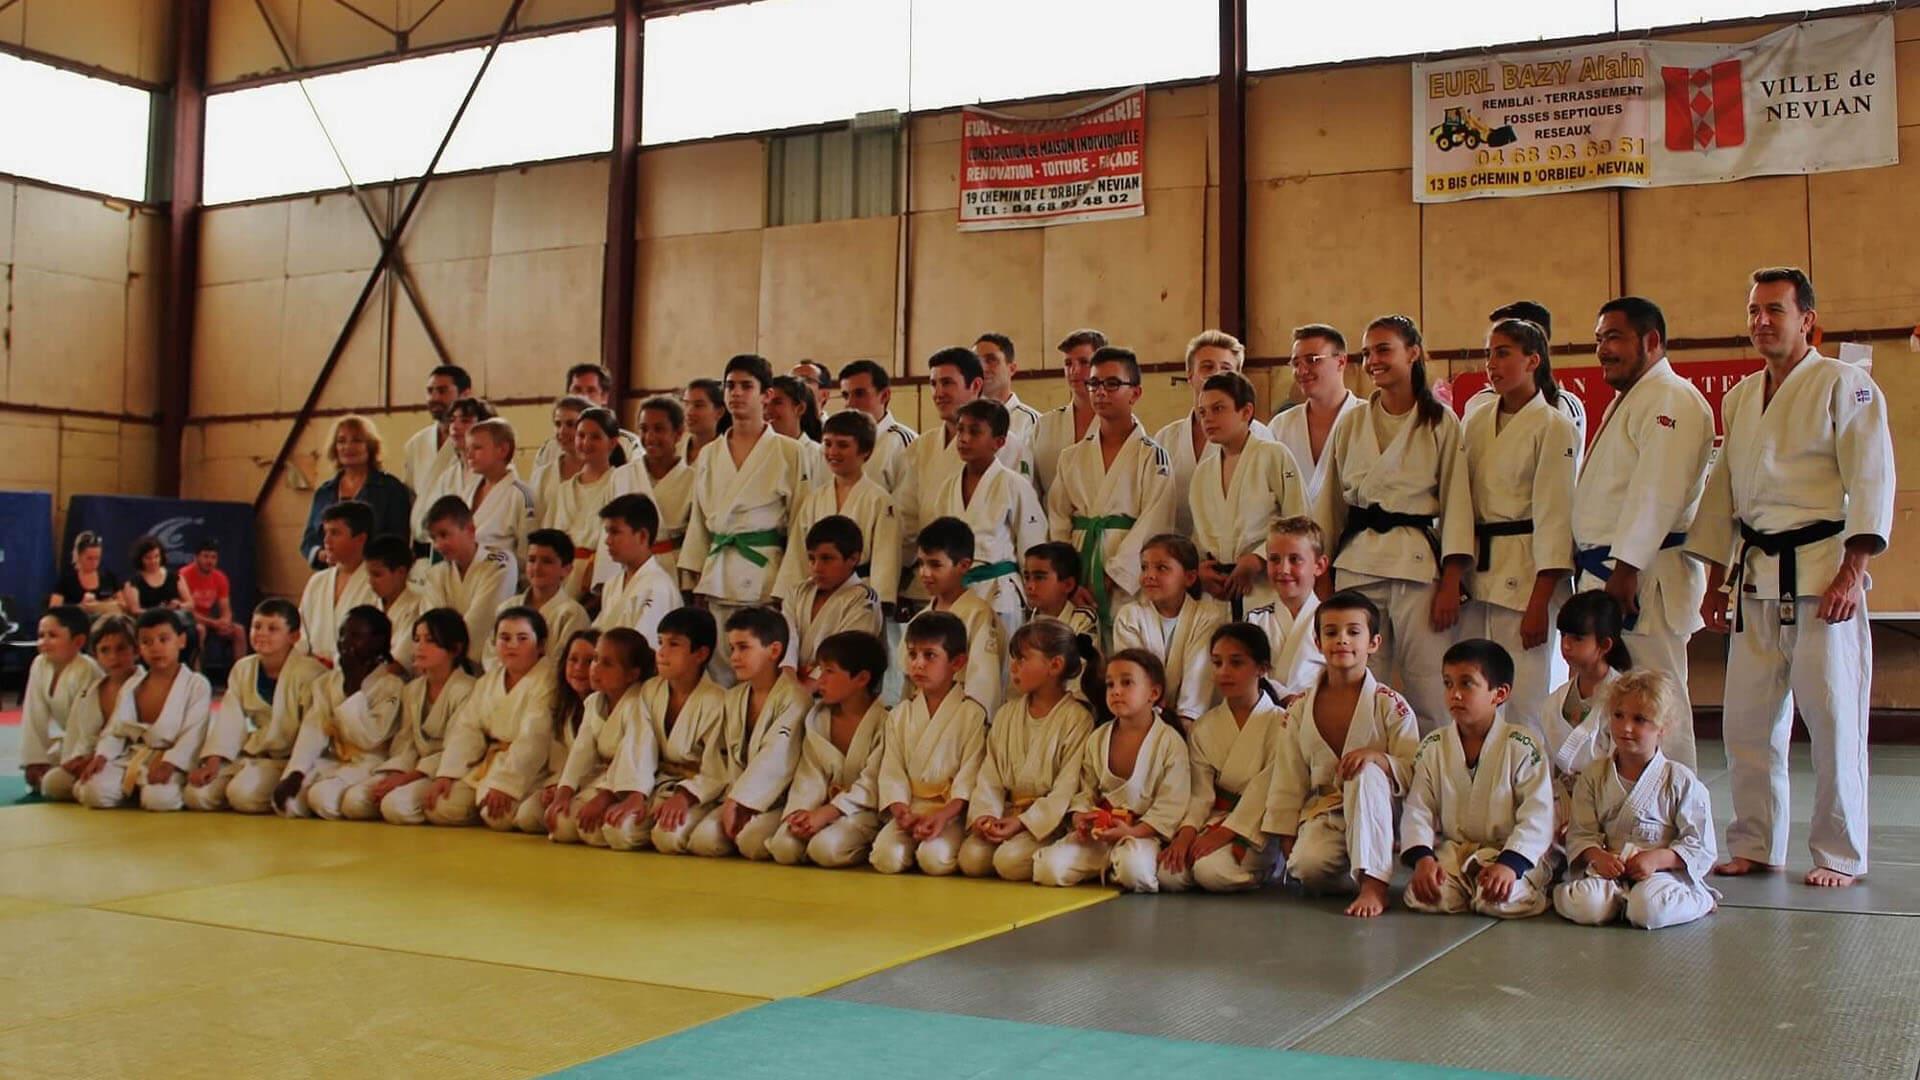 Judo Club Névianais